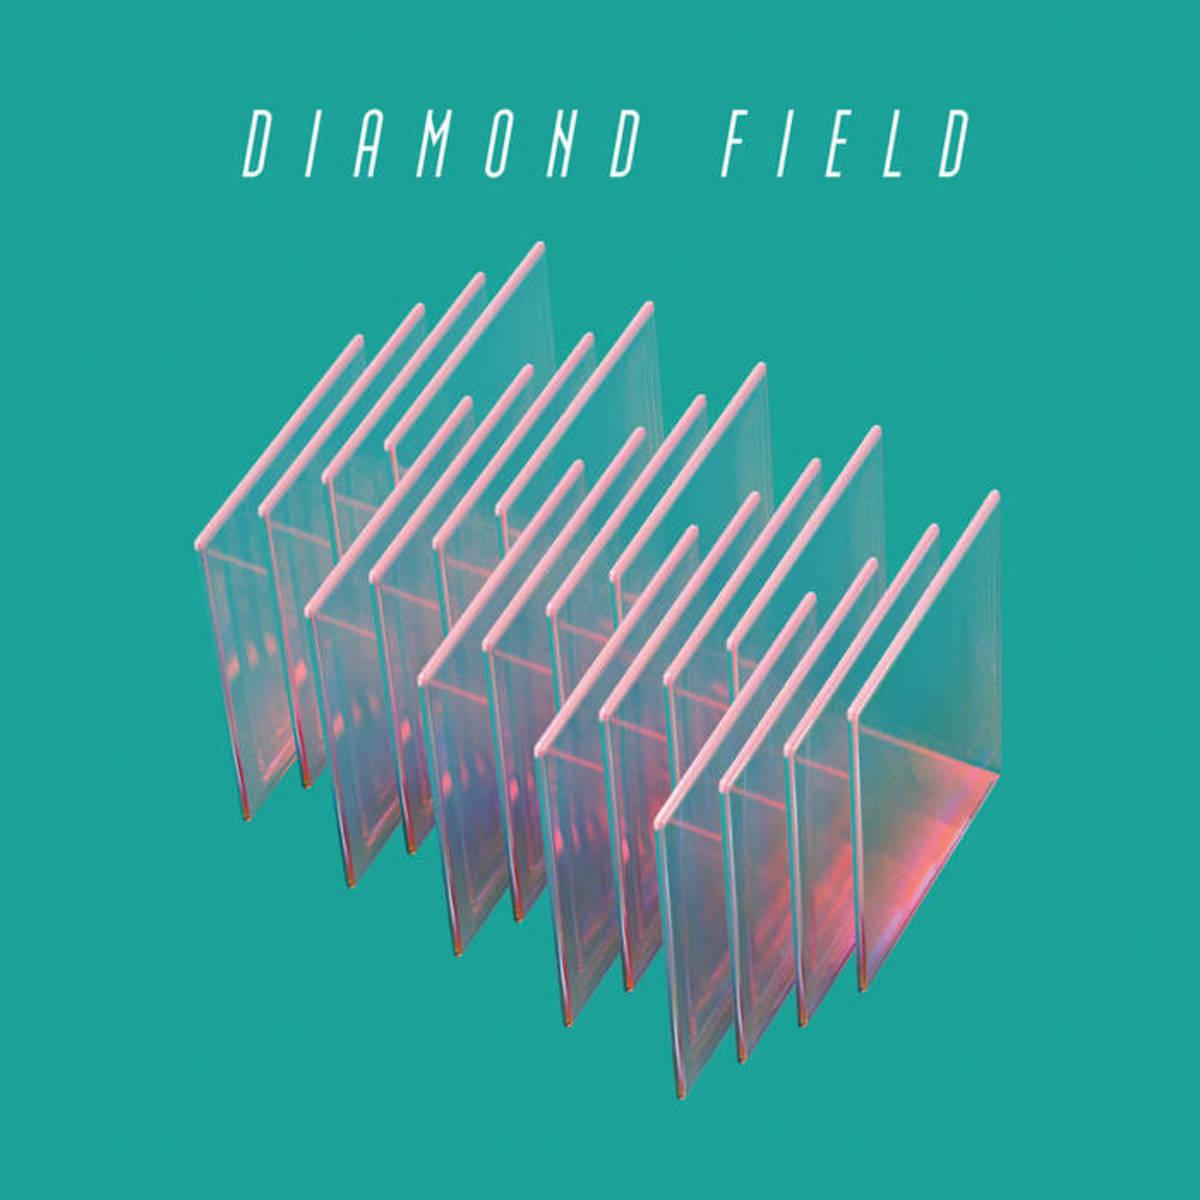 synth-album-review-diamond-field-by-diamond-field